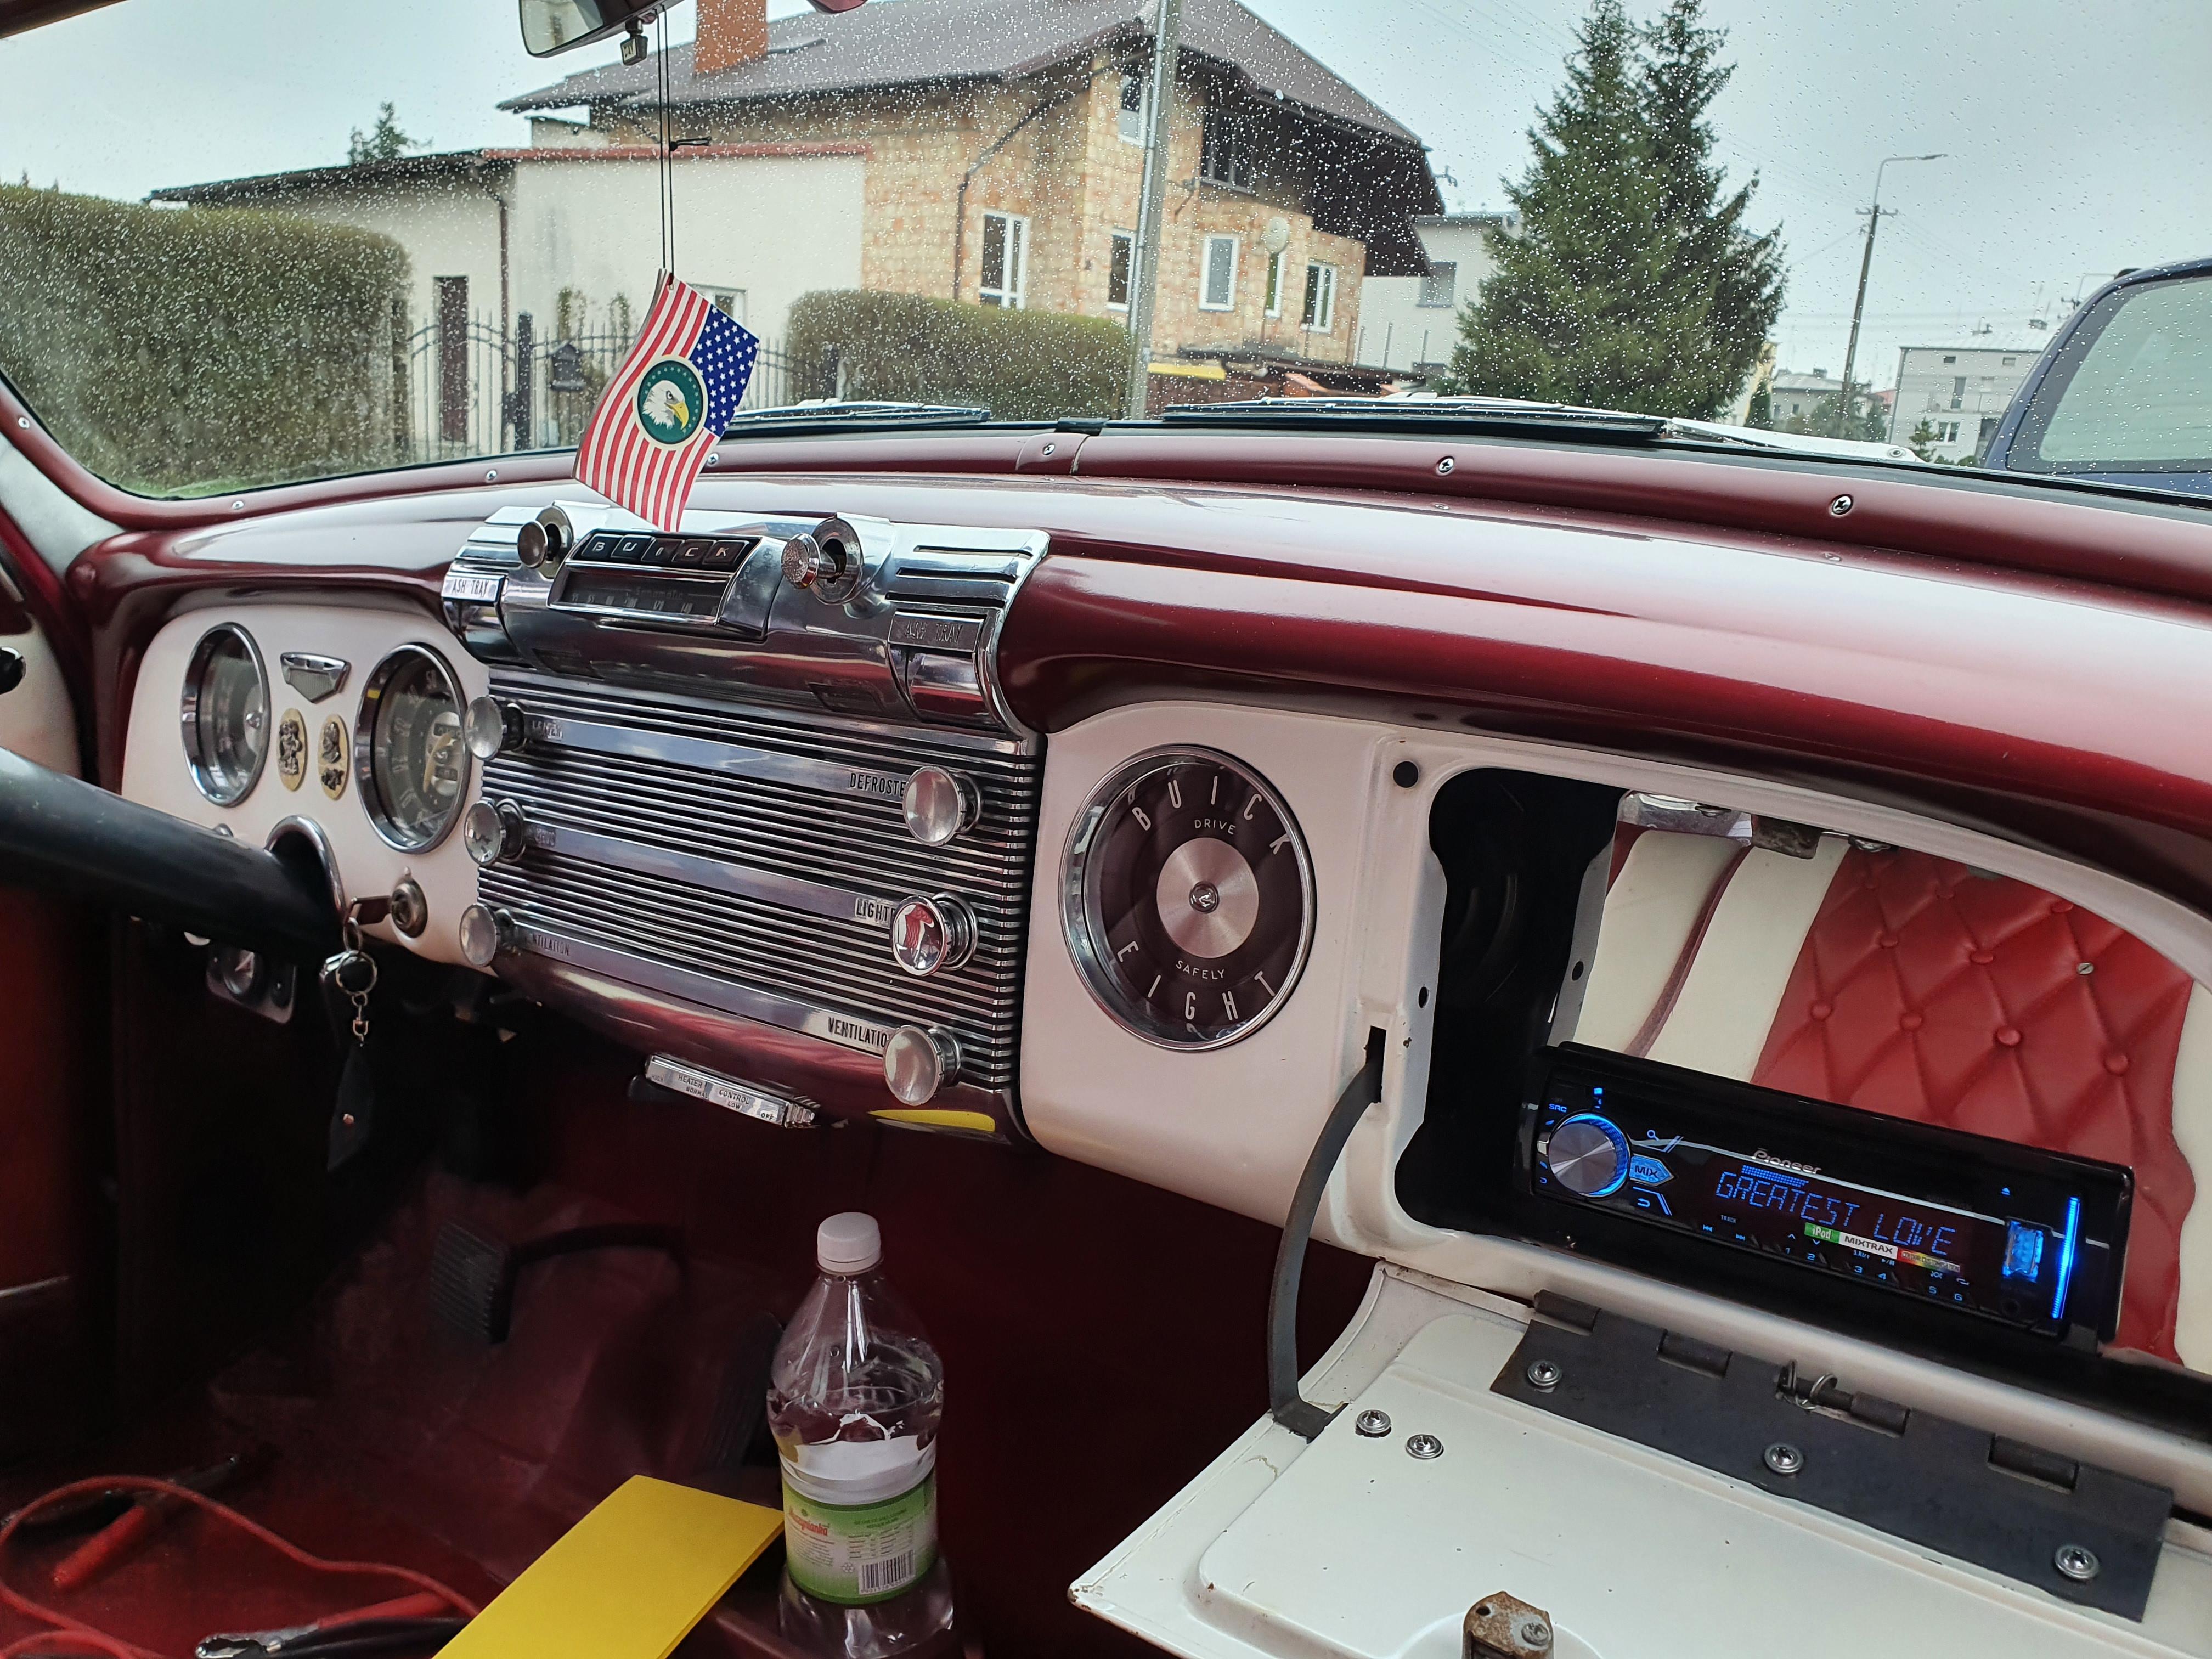 Buick_dzien_otwarty_do_slubu_2021_03_7